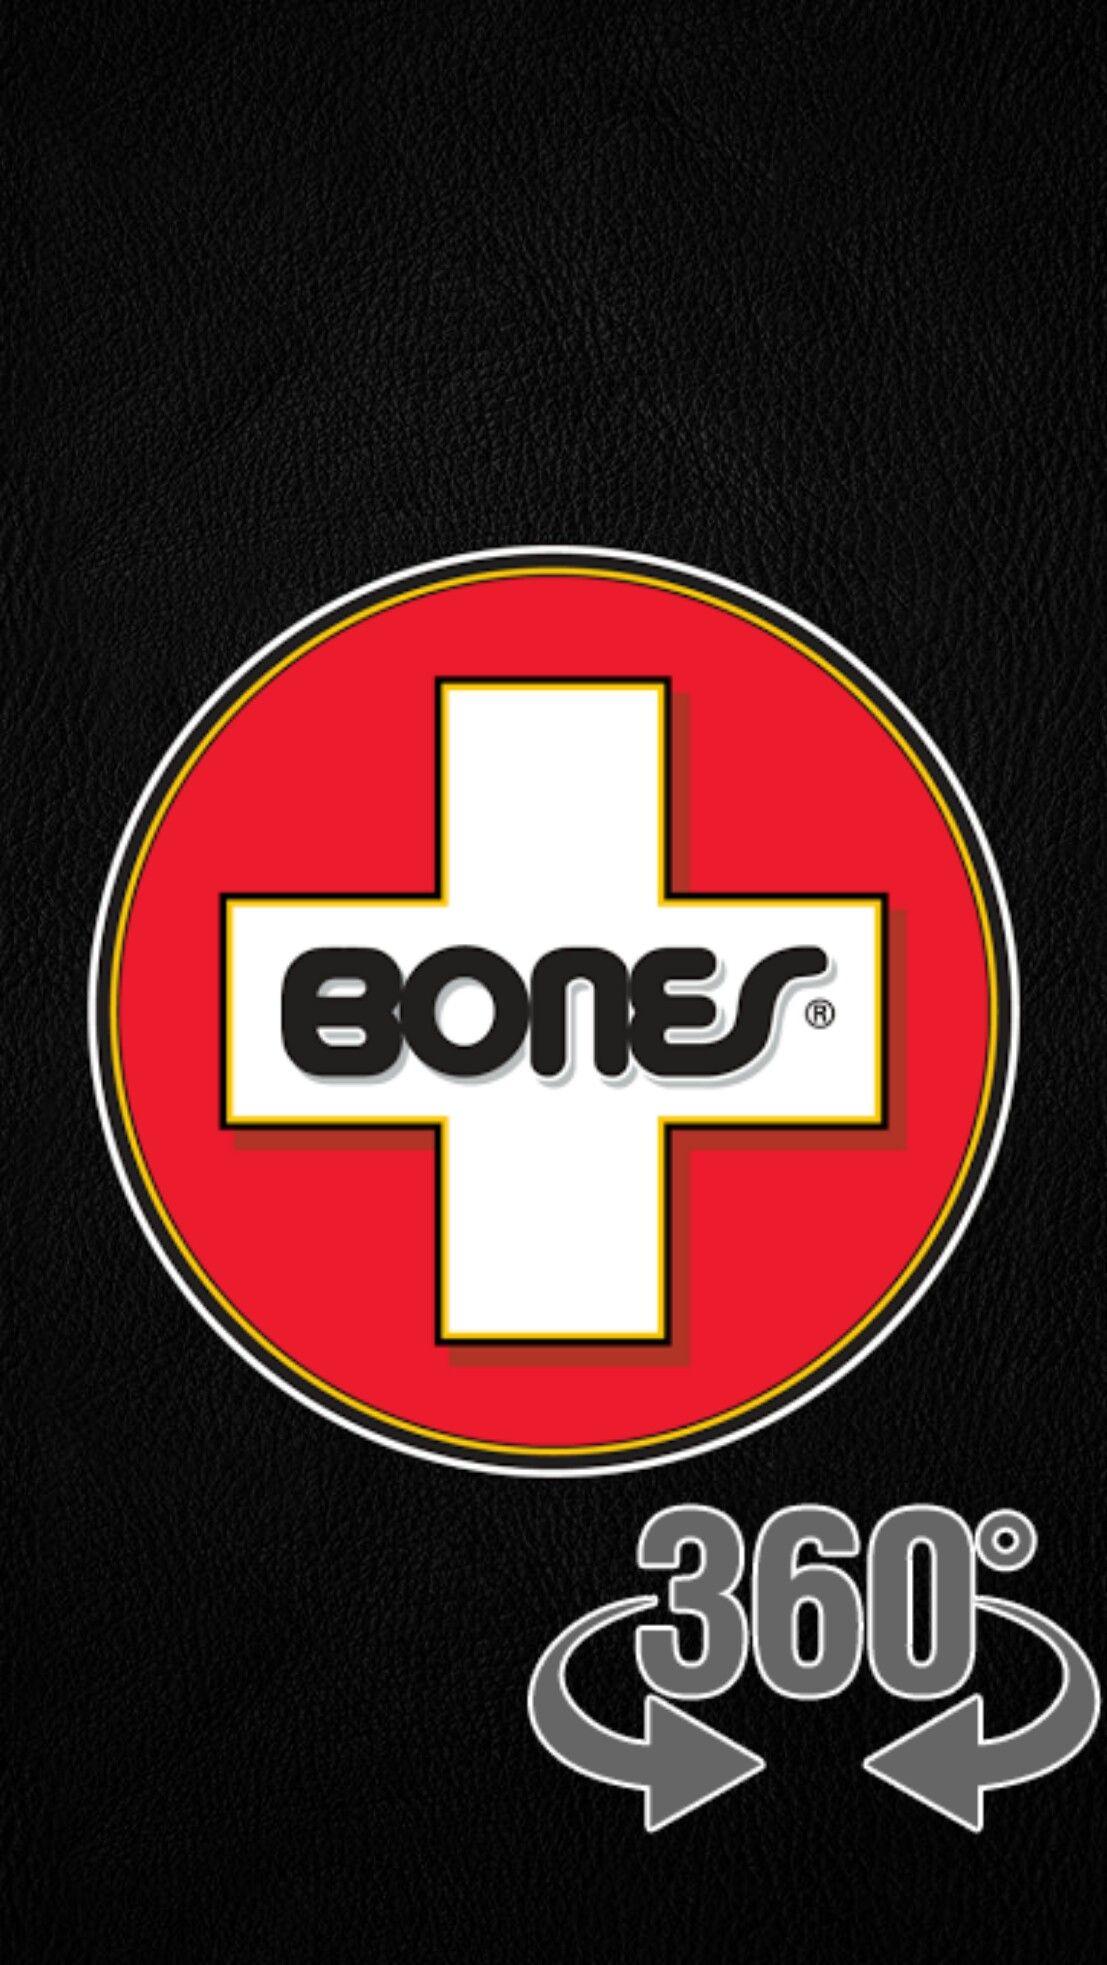 Skateboard Loading Black Wallpaper Android Iphone Logo Sticker Bones Brigade Skateboard Logo